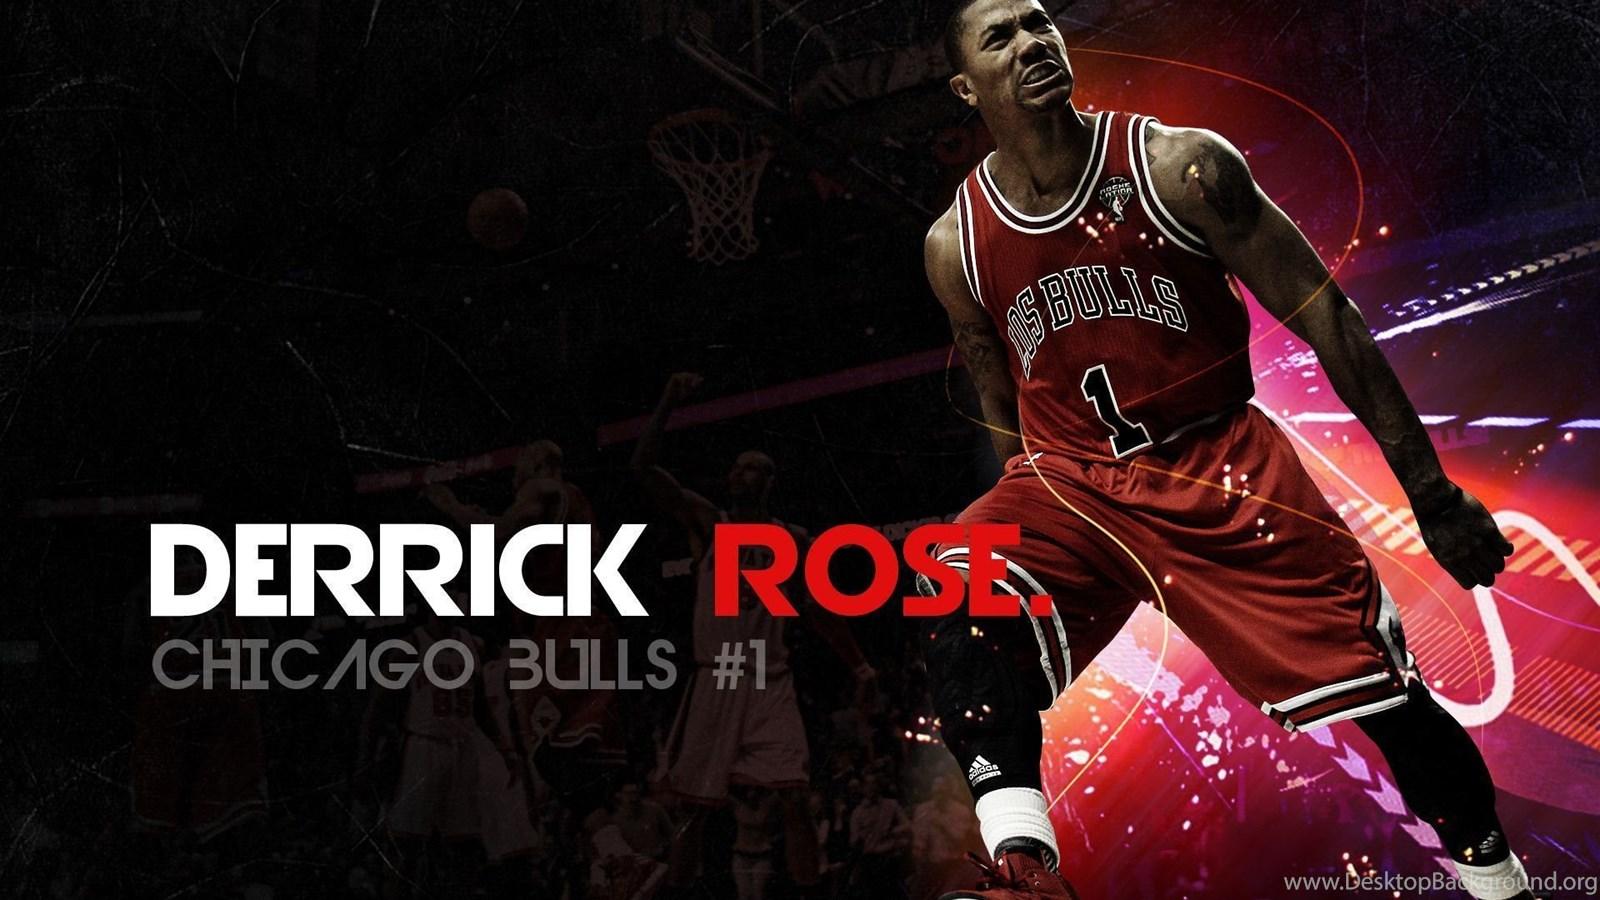 Derrick rose wallpapers hd desktop background popular voltagebd Image collections